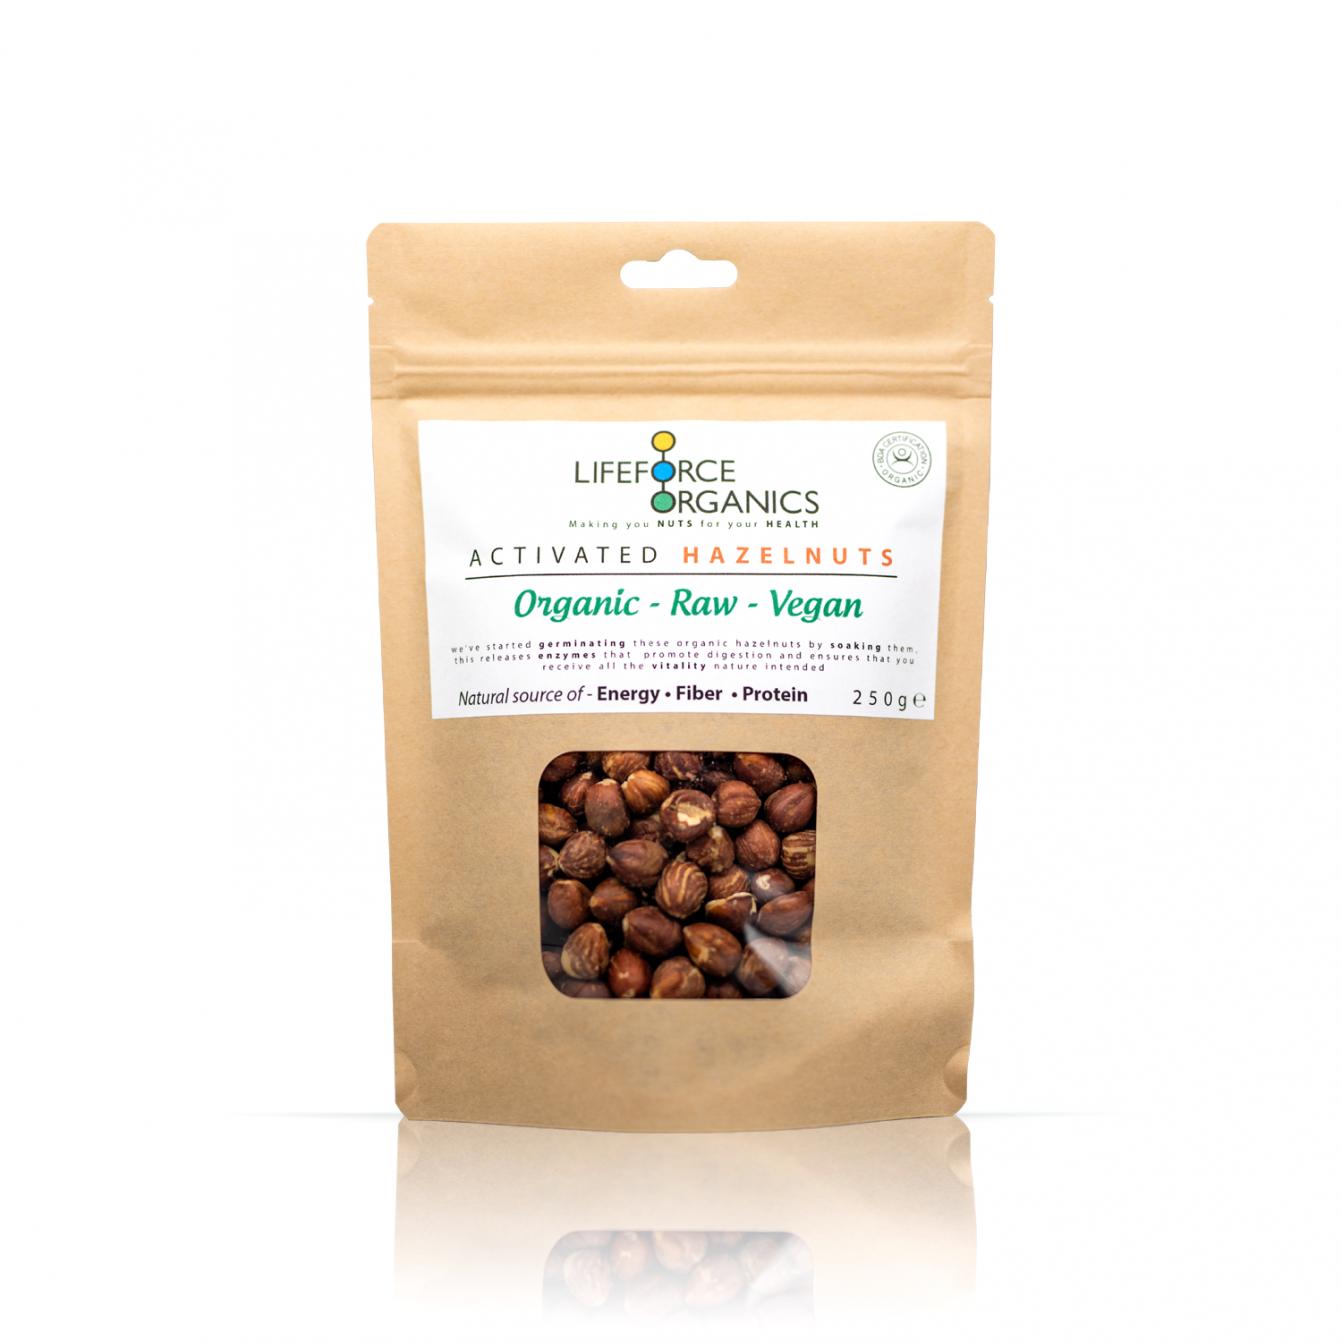 Activated Hazelnuts (Organic) 250g